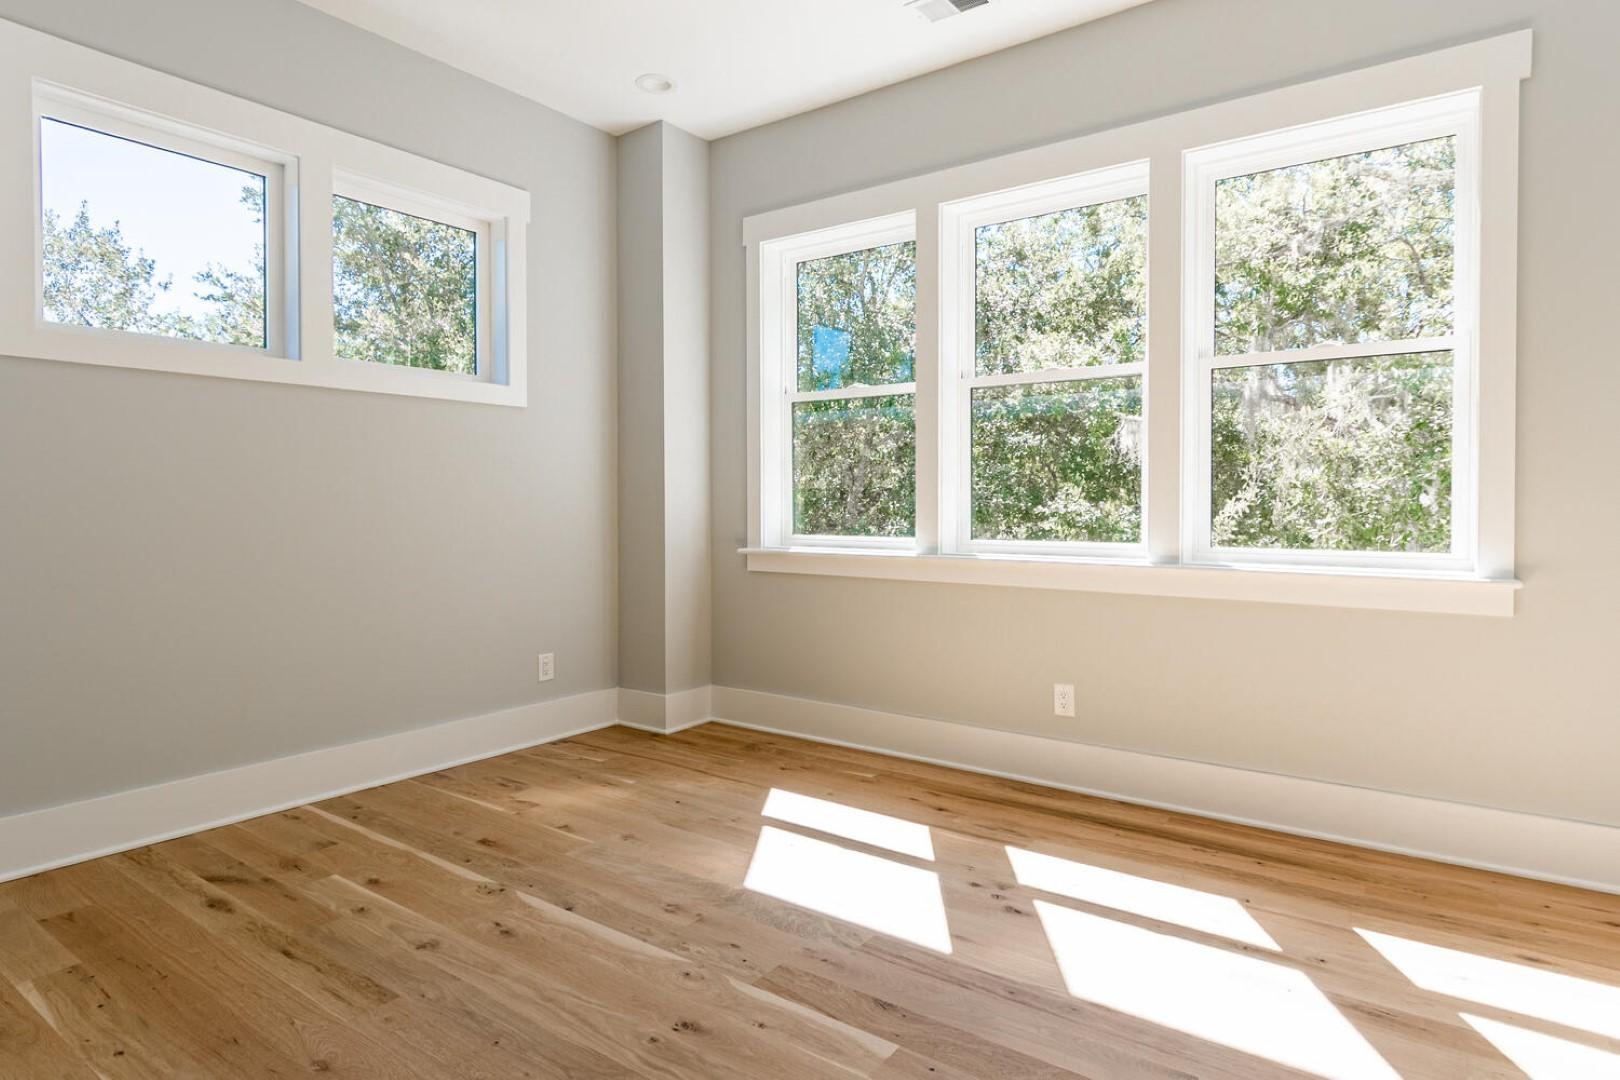 Scanlonville Homes For Sale - 156 5th, Mount Pleasant, SC - 19